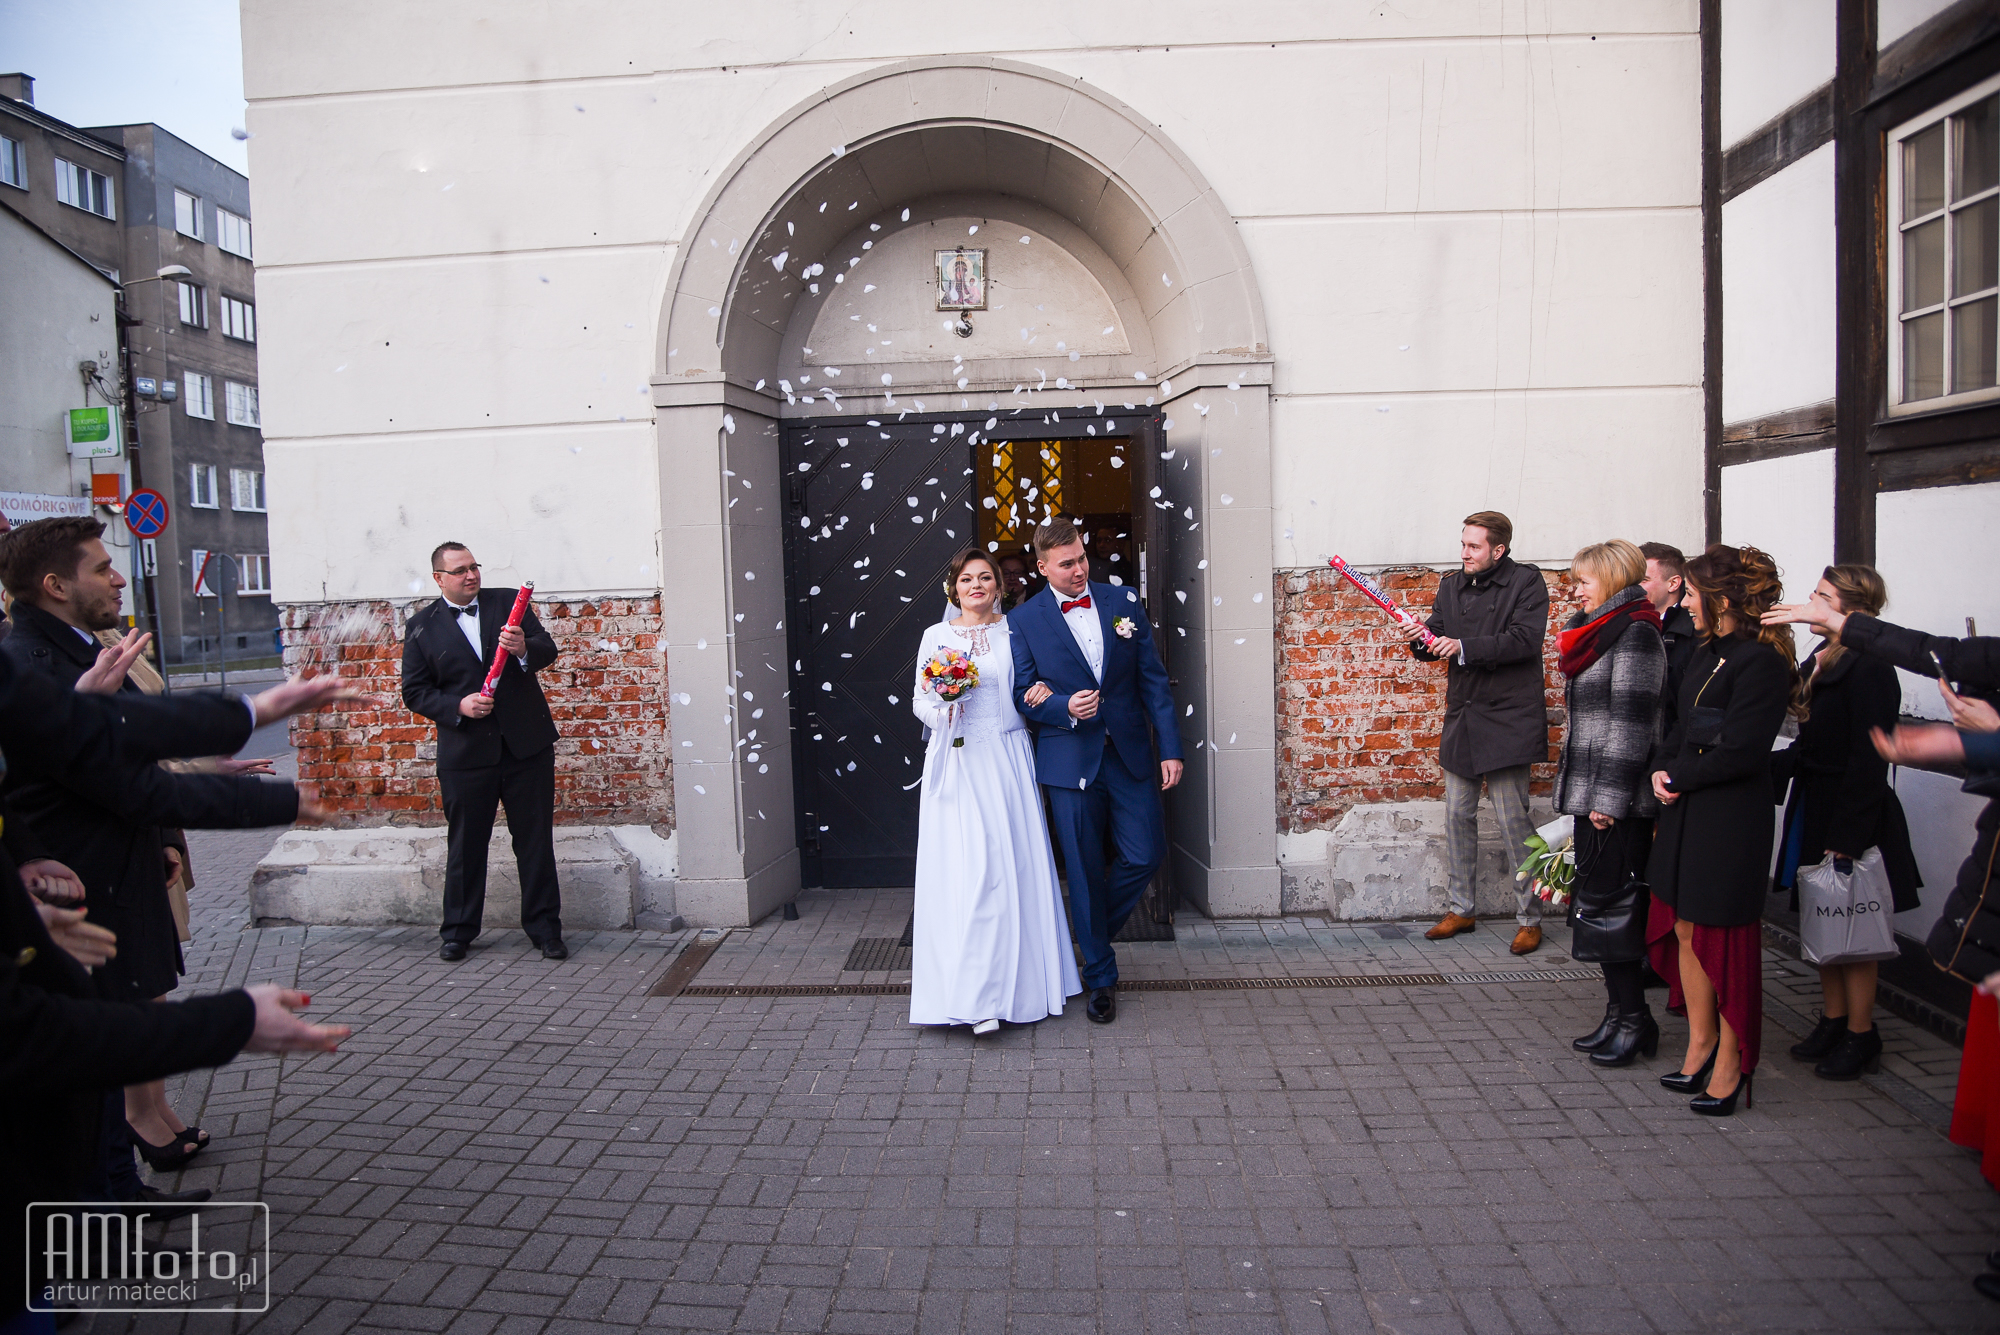 Anna&Karol_a_wesele__www_amfoto_pl-0920.jpg